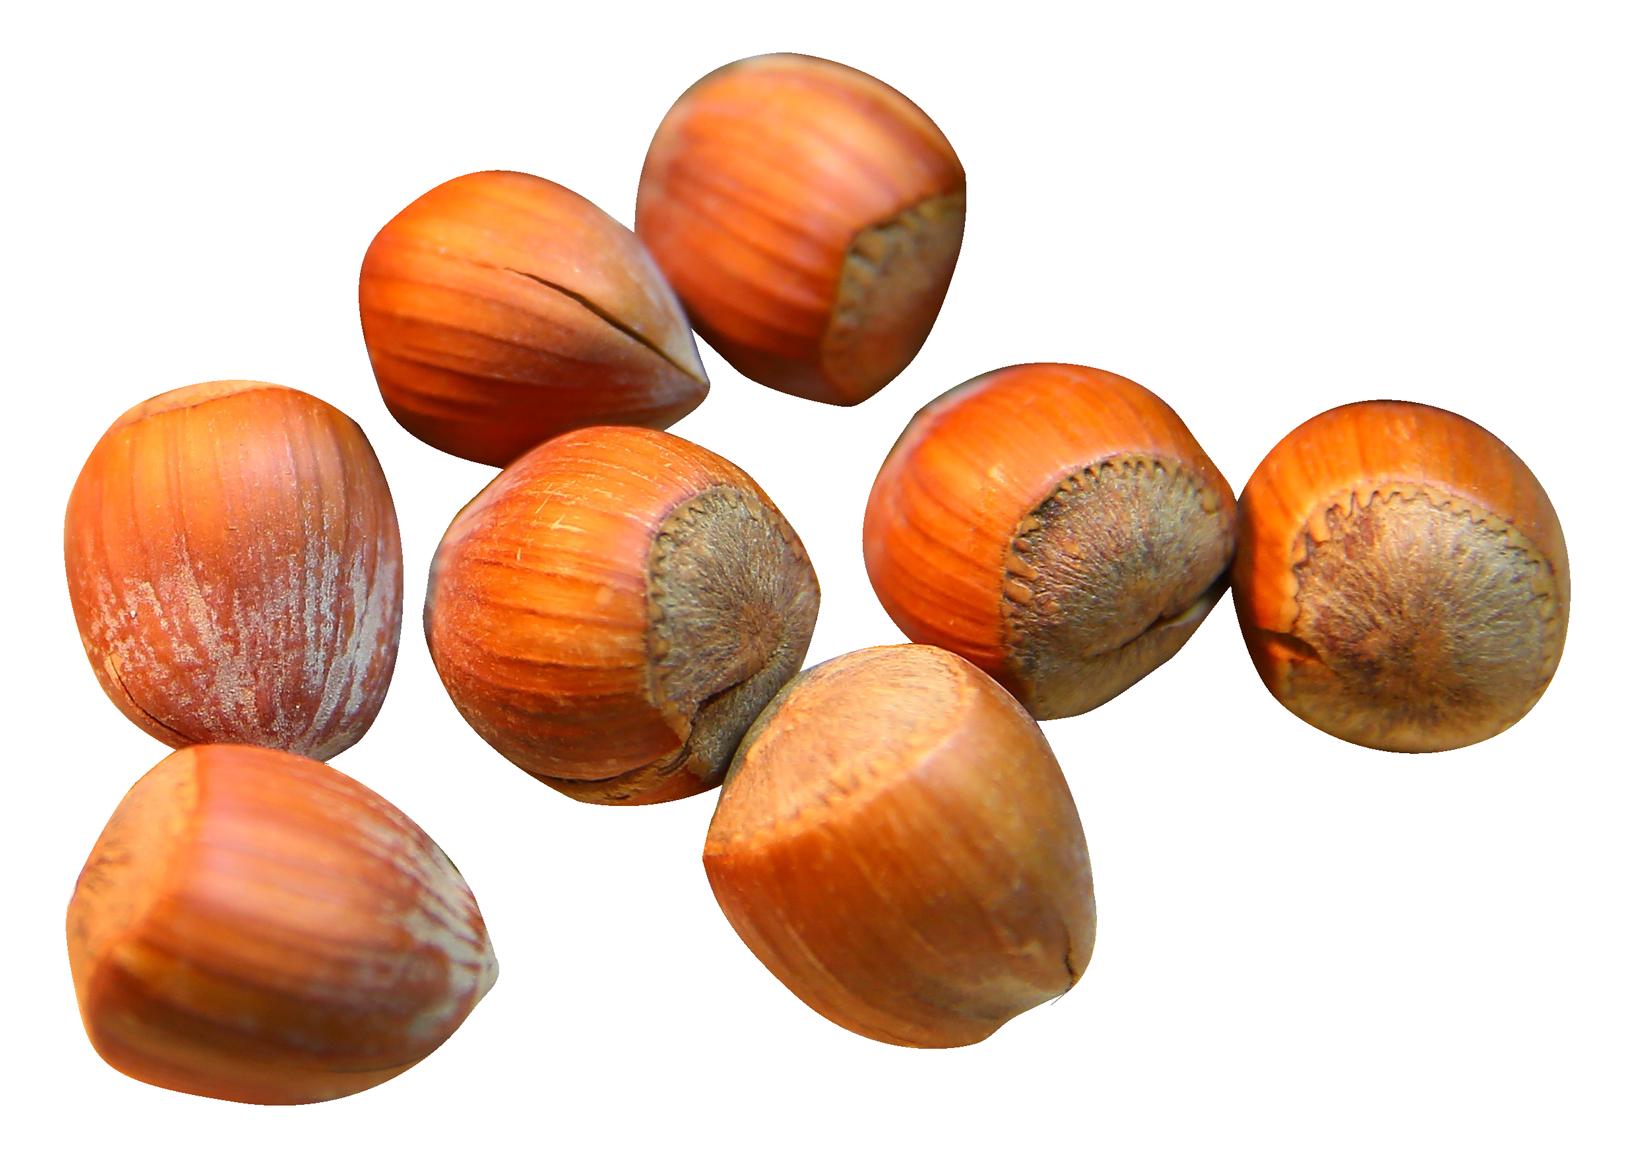 Nut clipart hazelnut. Png image purepng free